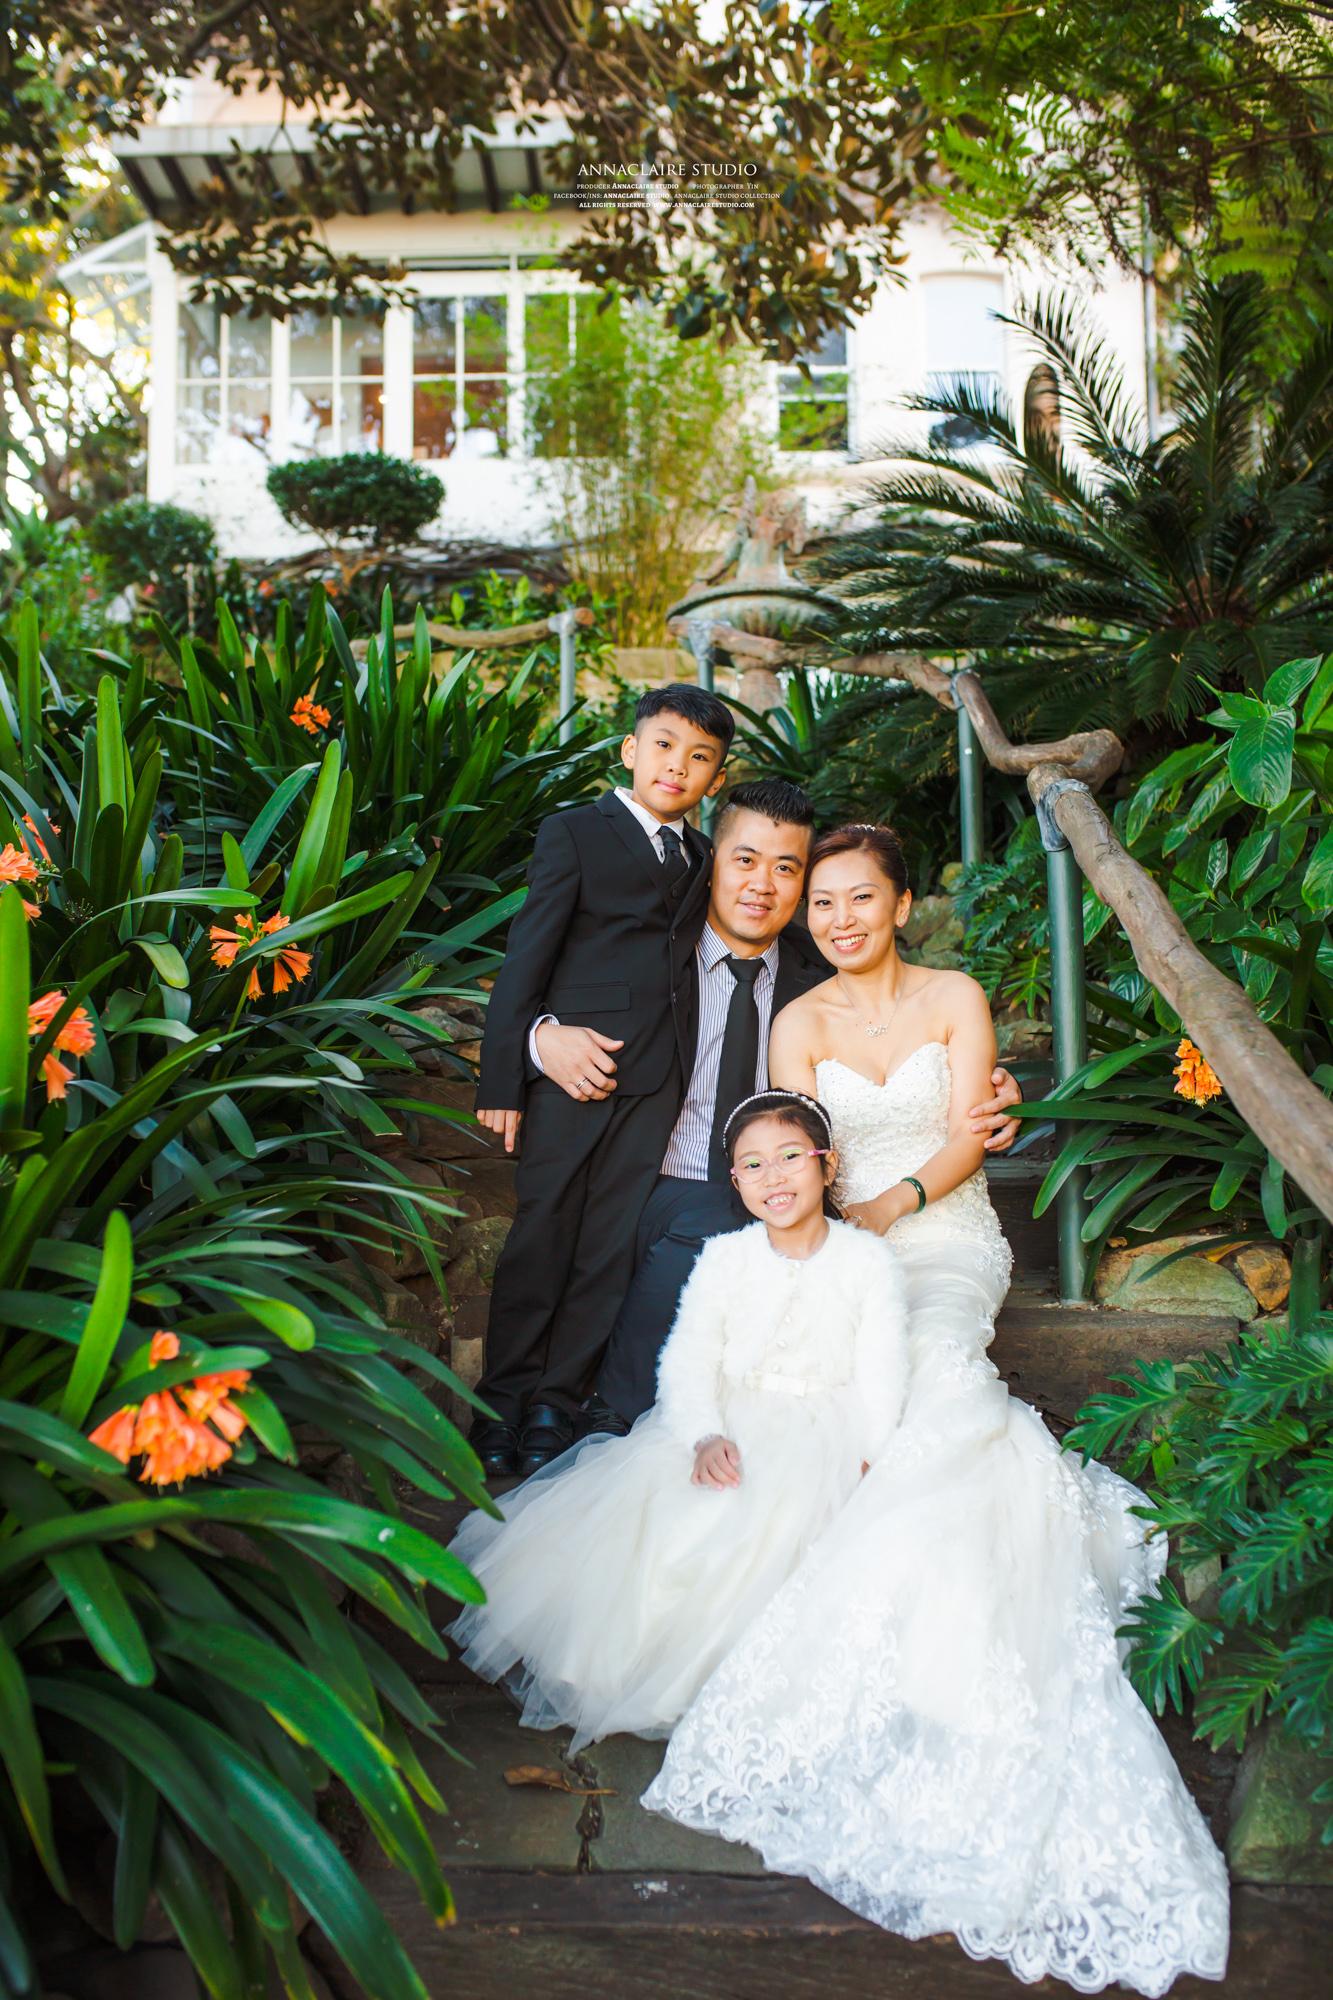 Family  photo by annaclaire studio 悉尼全家福 (2 of 5).jpg